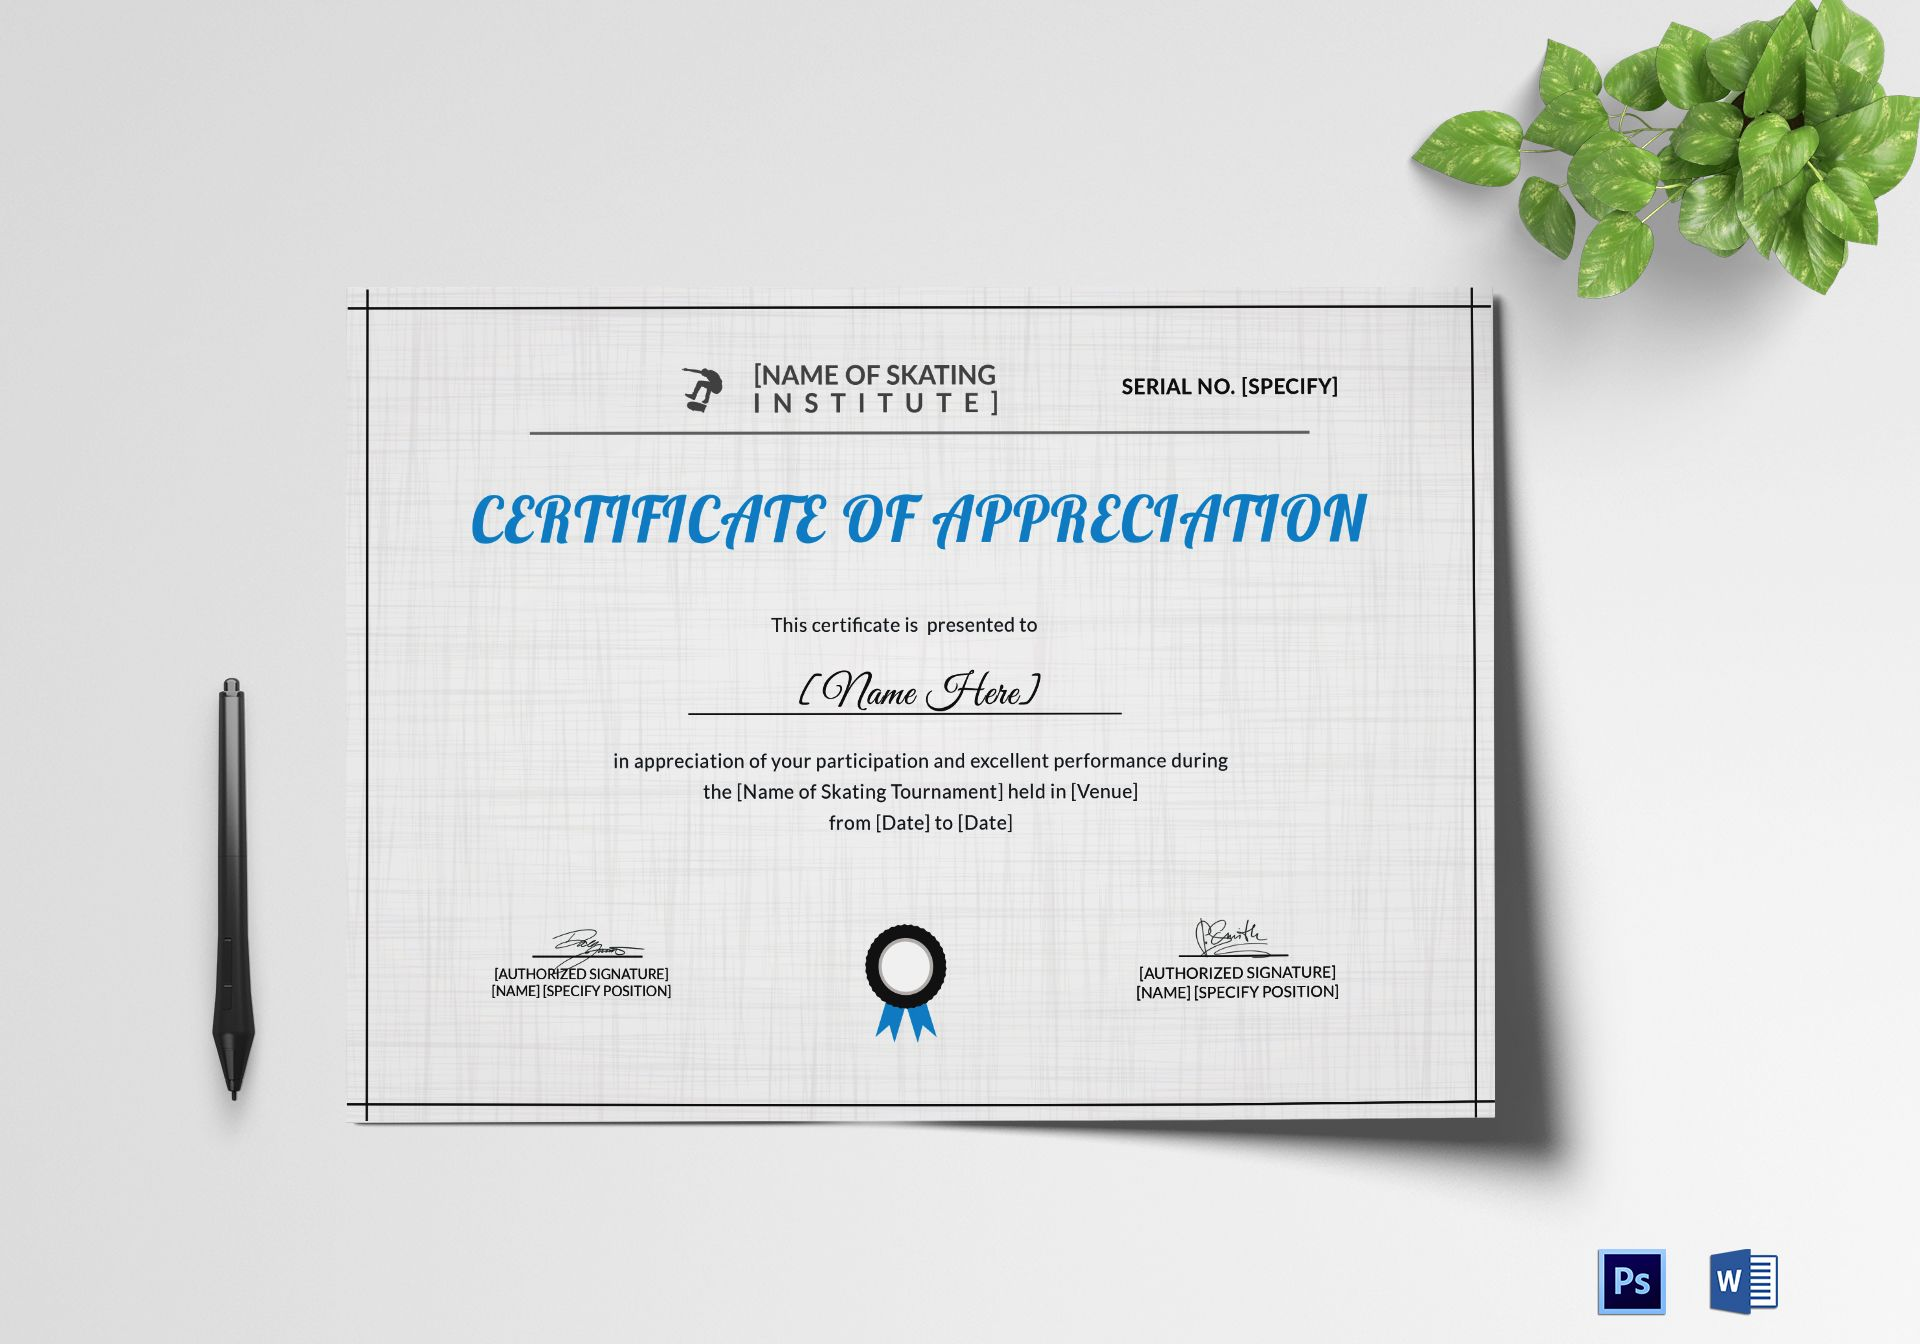 Appreciation Certificate of Skating